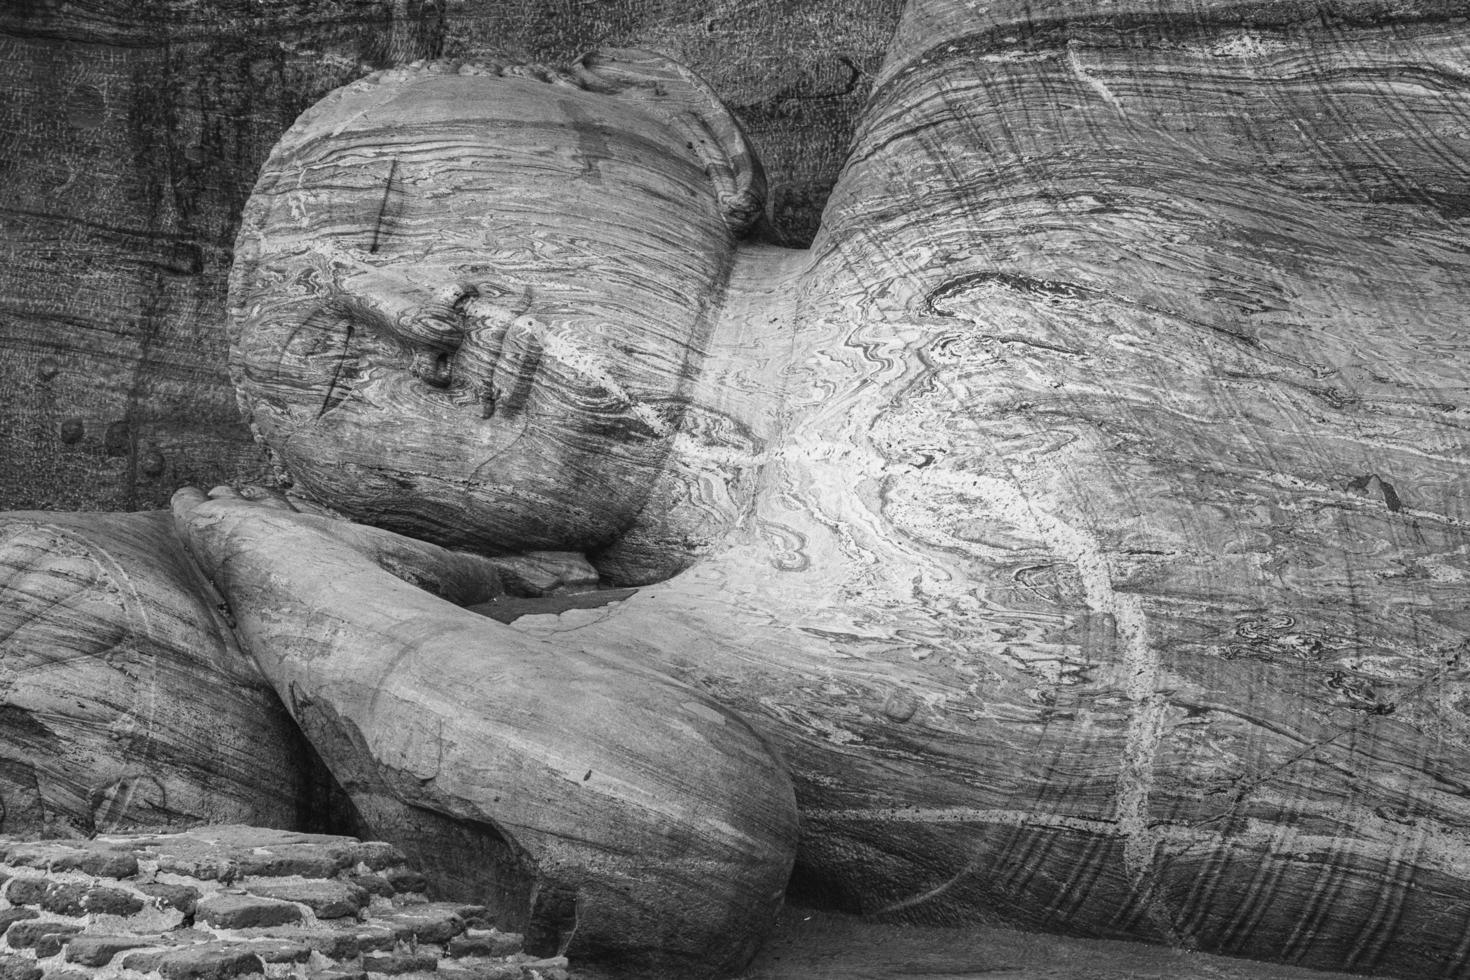 Buddha statue in nirvana position, Sri Lanka cave in Pidurangala photo